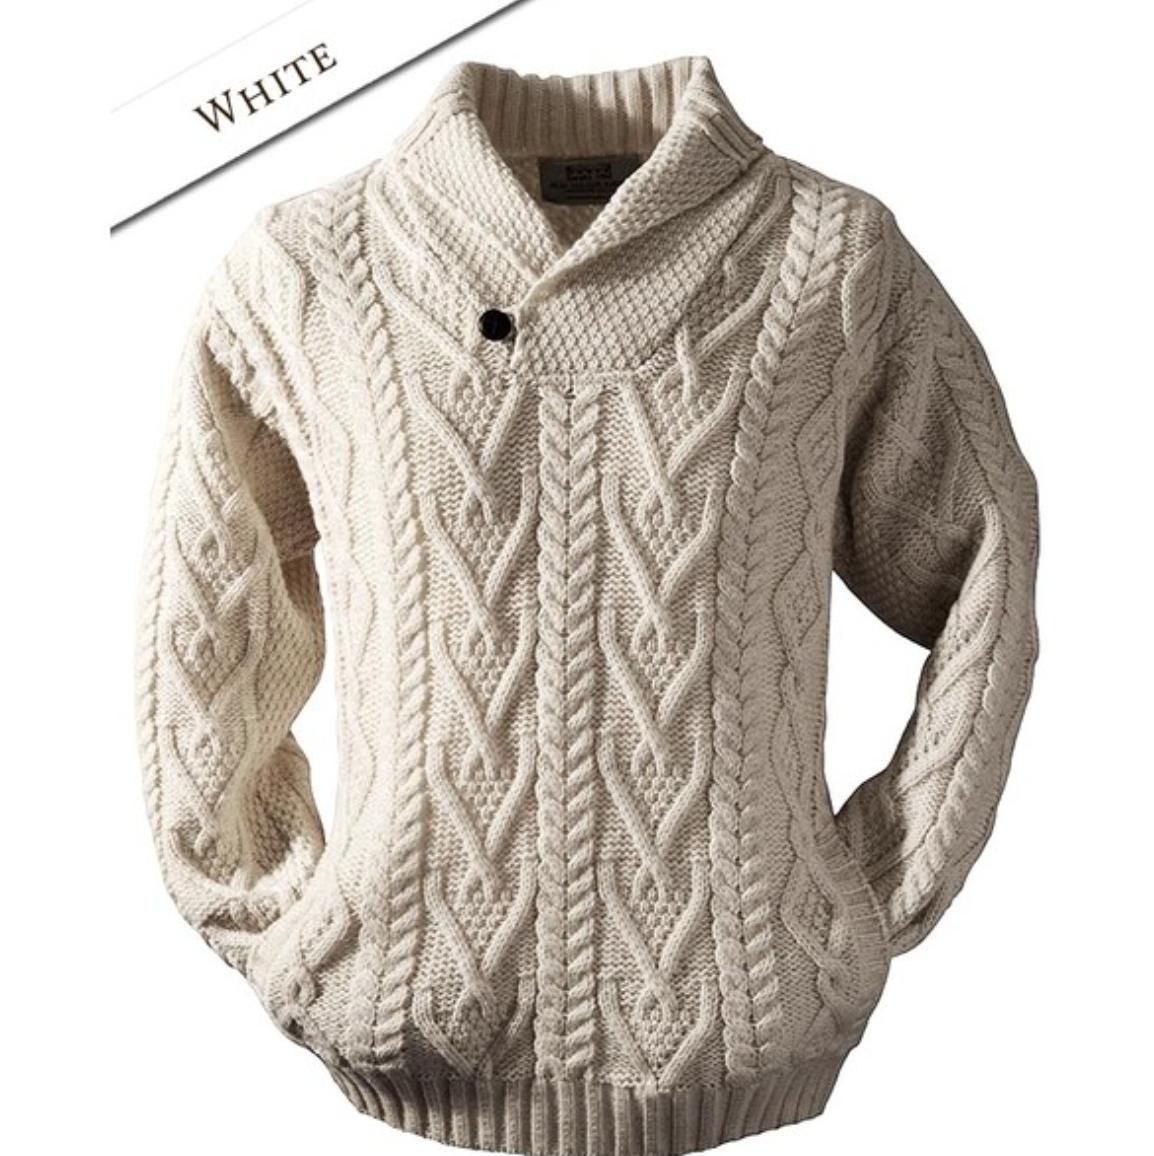 Fisherman sweater | tejido | Pinterest | Tejido, Sueter hombre y Dos ...